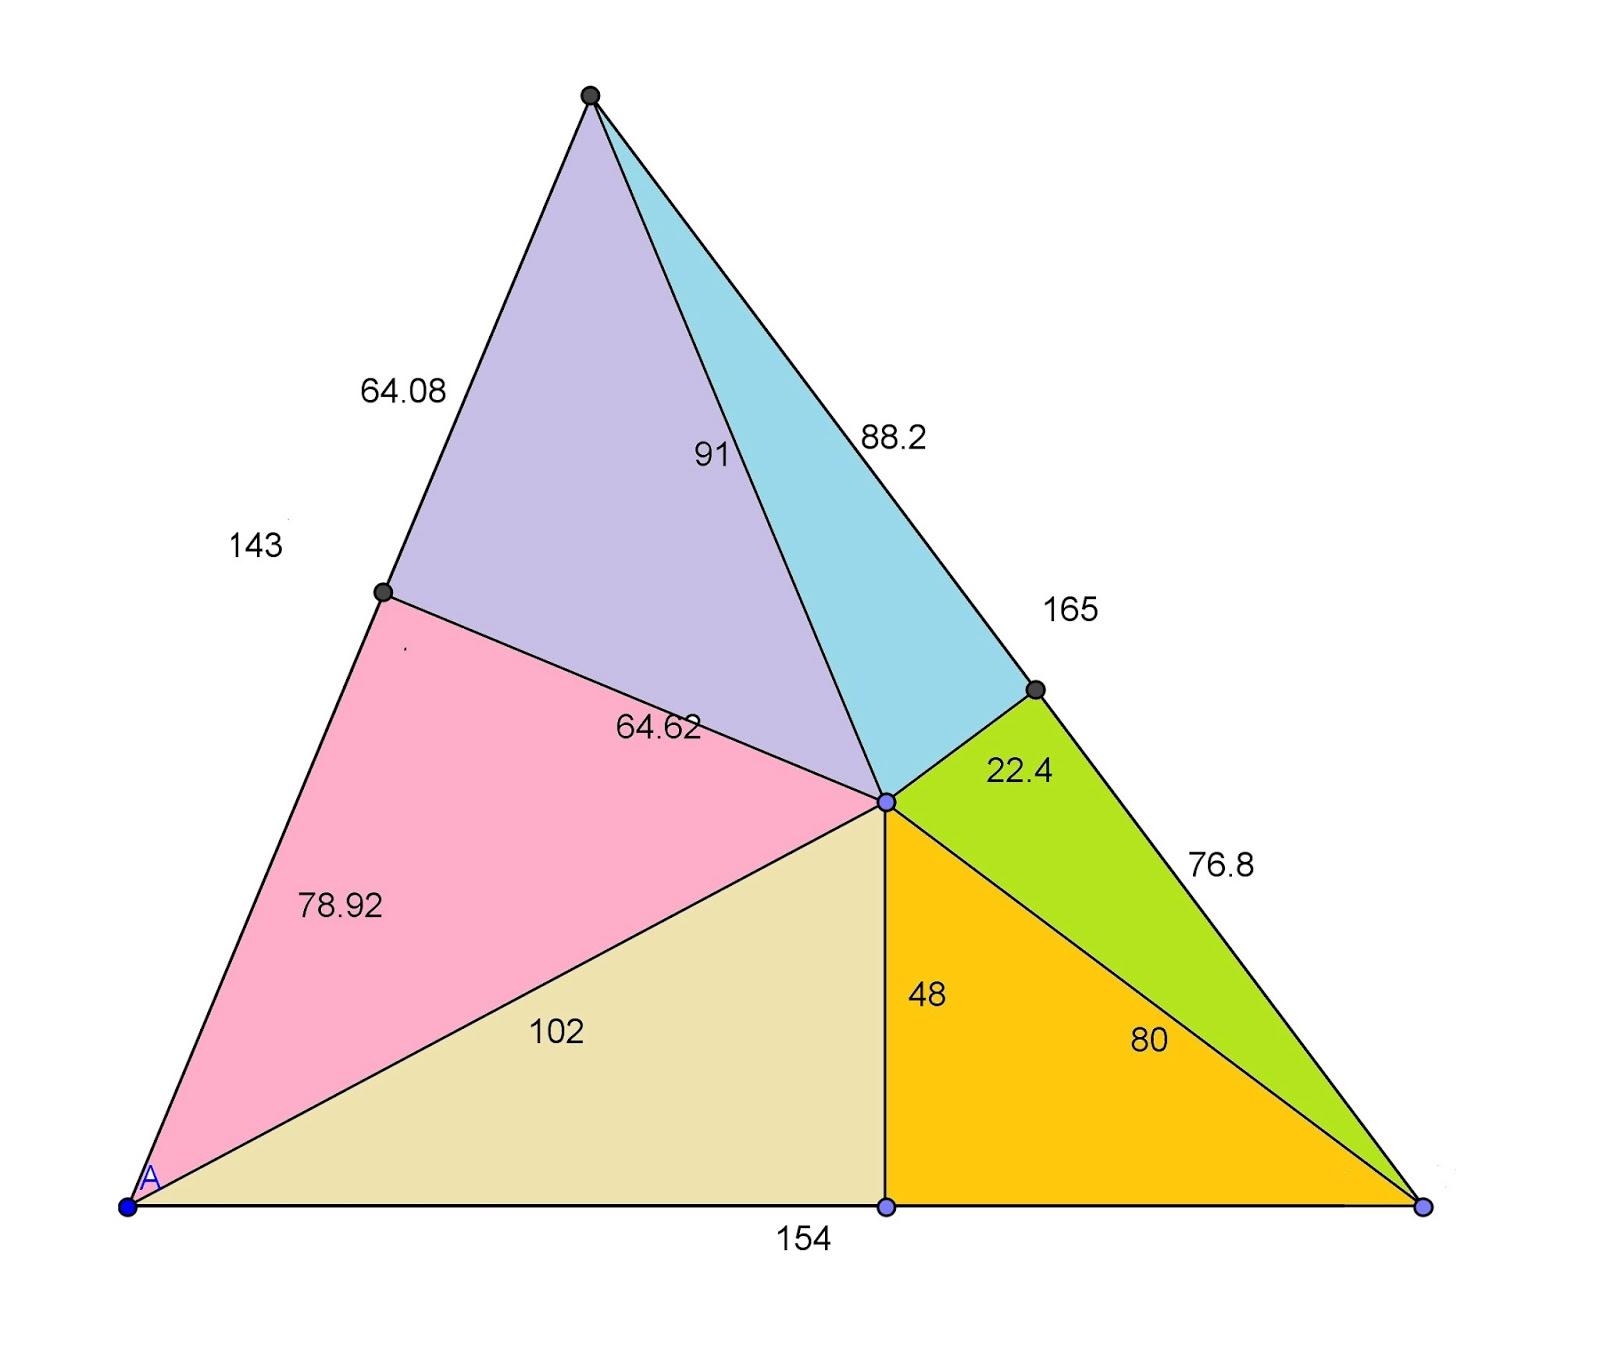 Happy Right Triangle Day! 12/5/13 | seek echo